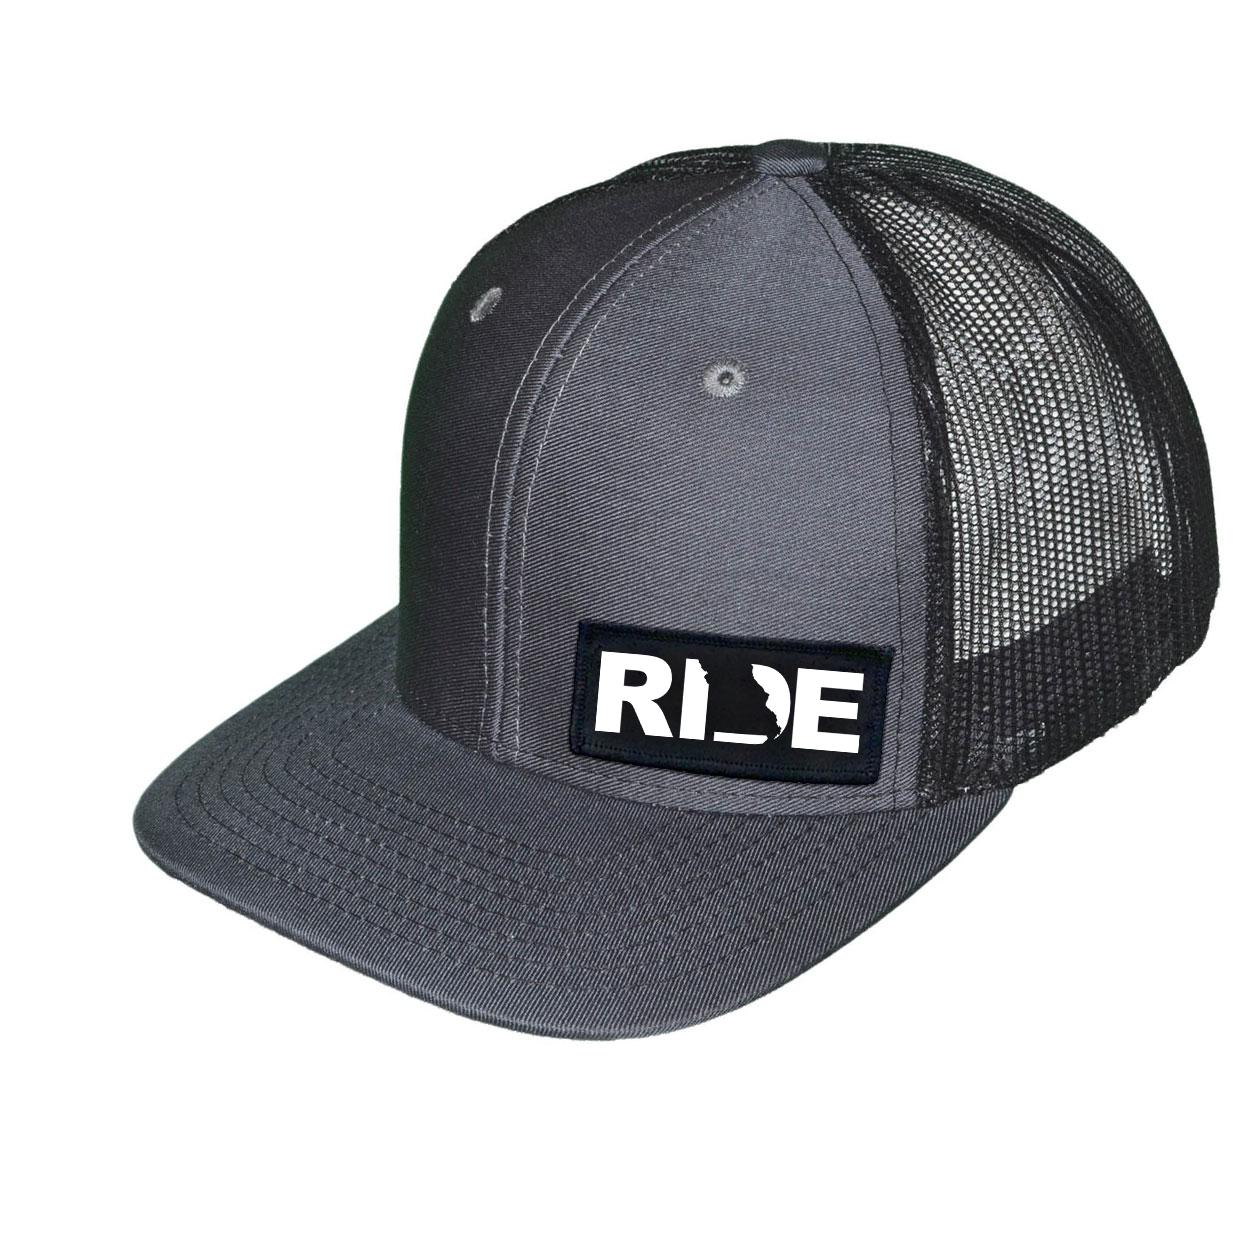 Ride Missouri Night Out Woven Patch Snapback Trucker Hat Dark Gray/Black (White Logo)